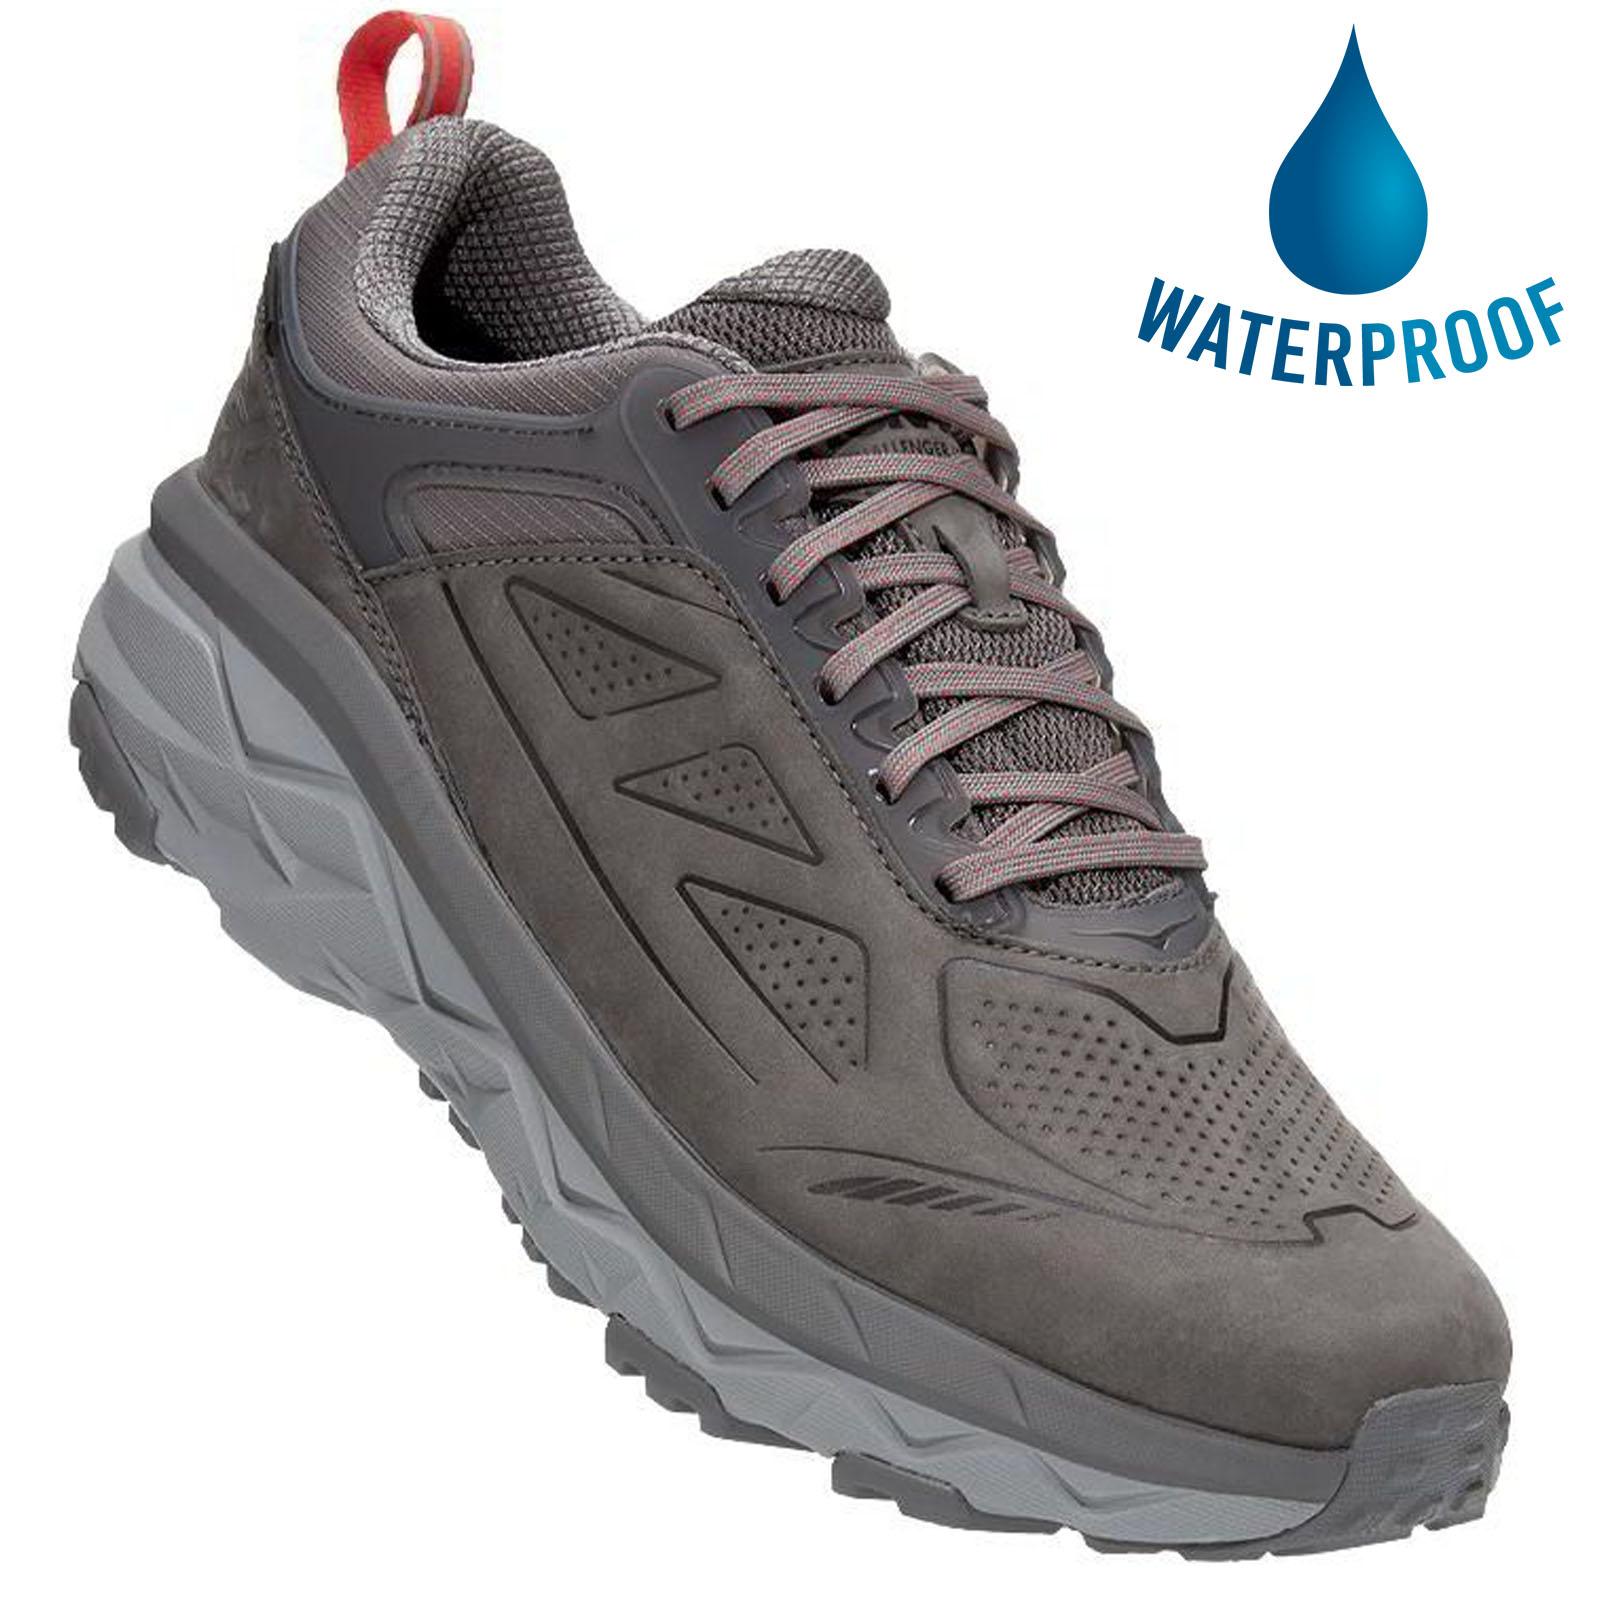 Hoka One One Mens Challenger Low GTX Waterproof Trail Running Shoes - Charcoal Grey Fiesta